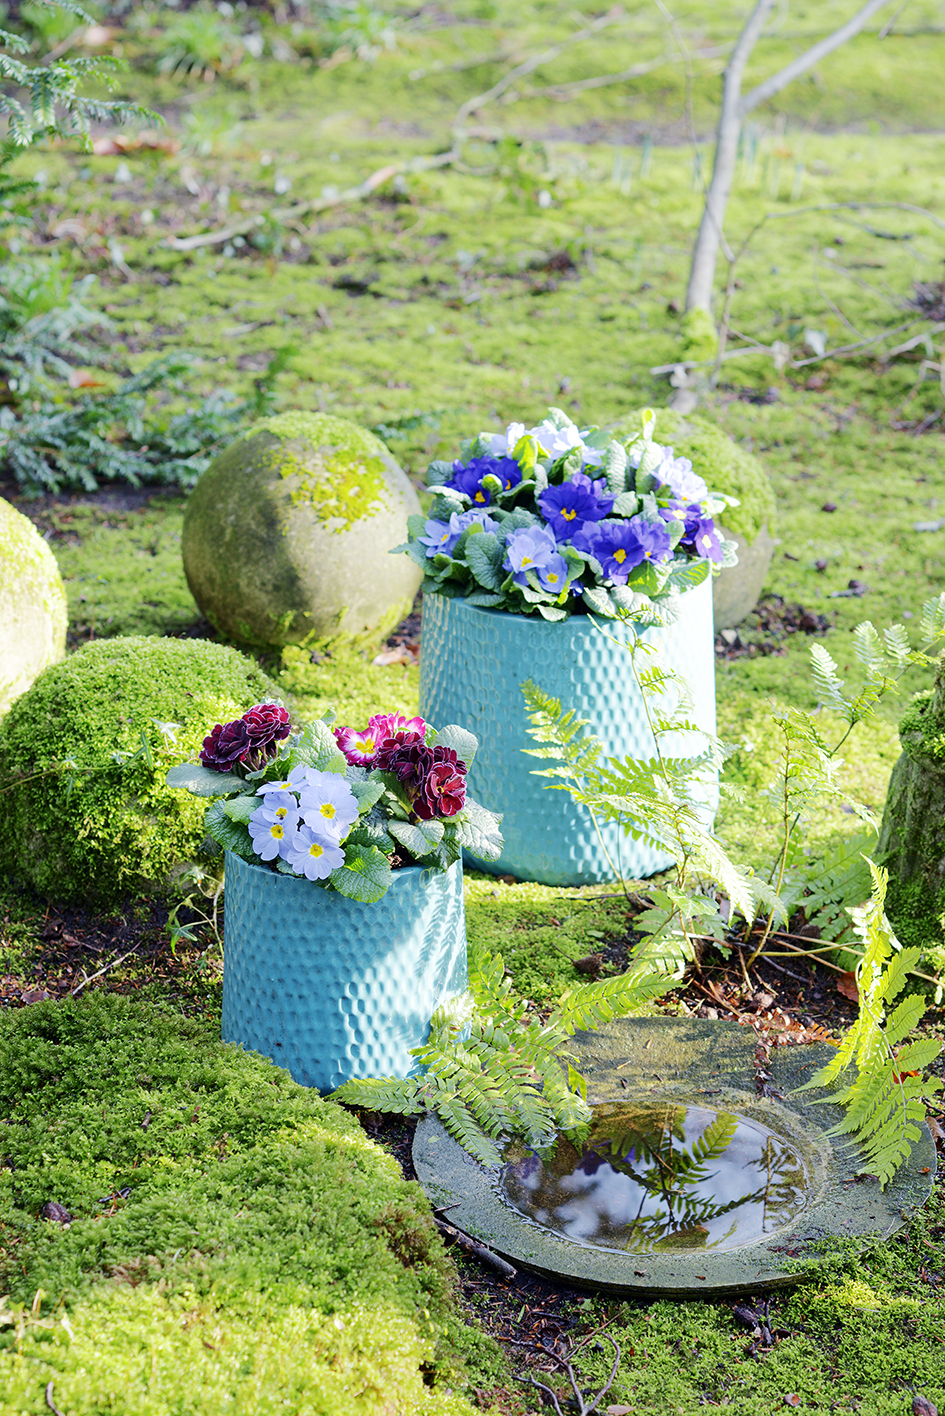 La primev re des jardins ma plante mon bonheur - Cactus porte bonheur ...